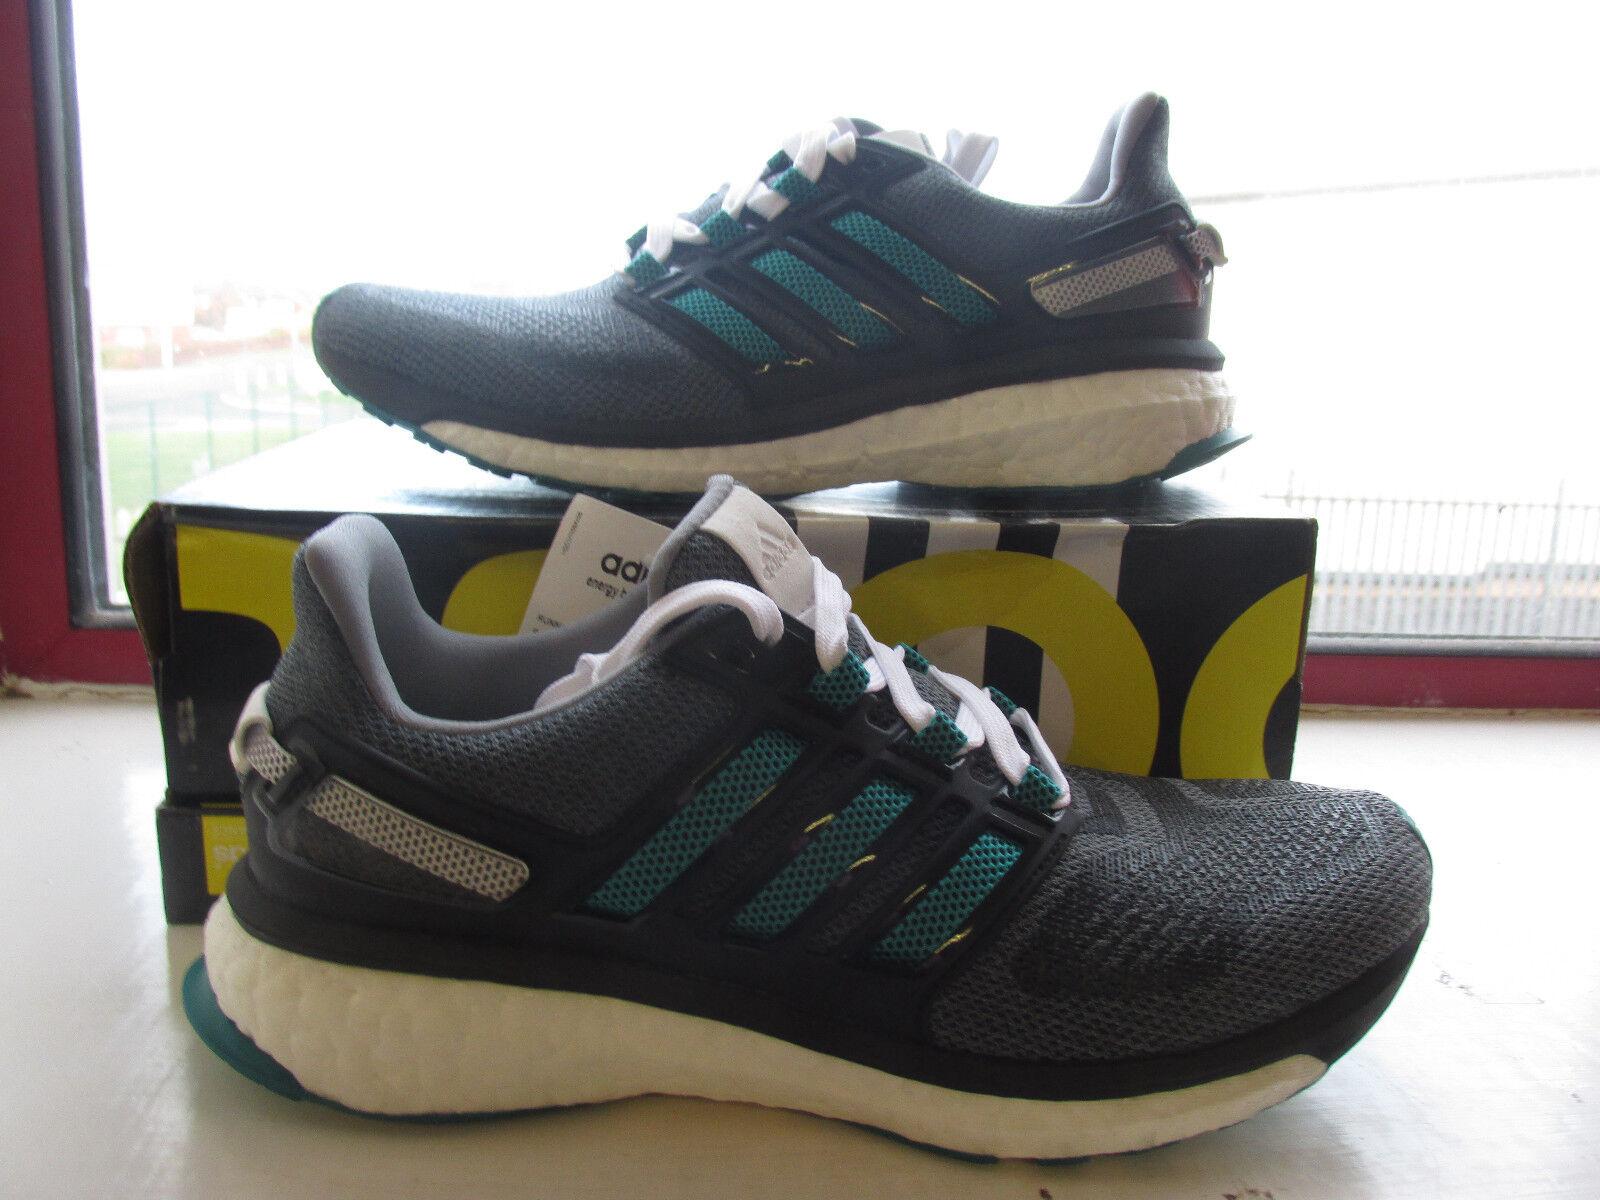 Más temprano Discurso estoy feliz  adidas Energy Boost W Running Trainers UK 4 EU 36.7 Ln50 83 for sale online  | eBay